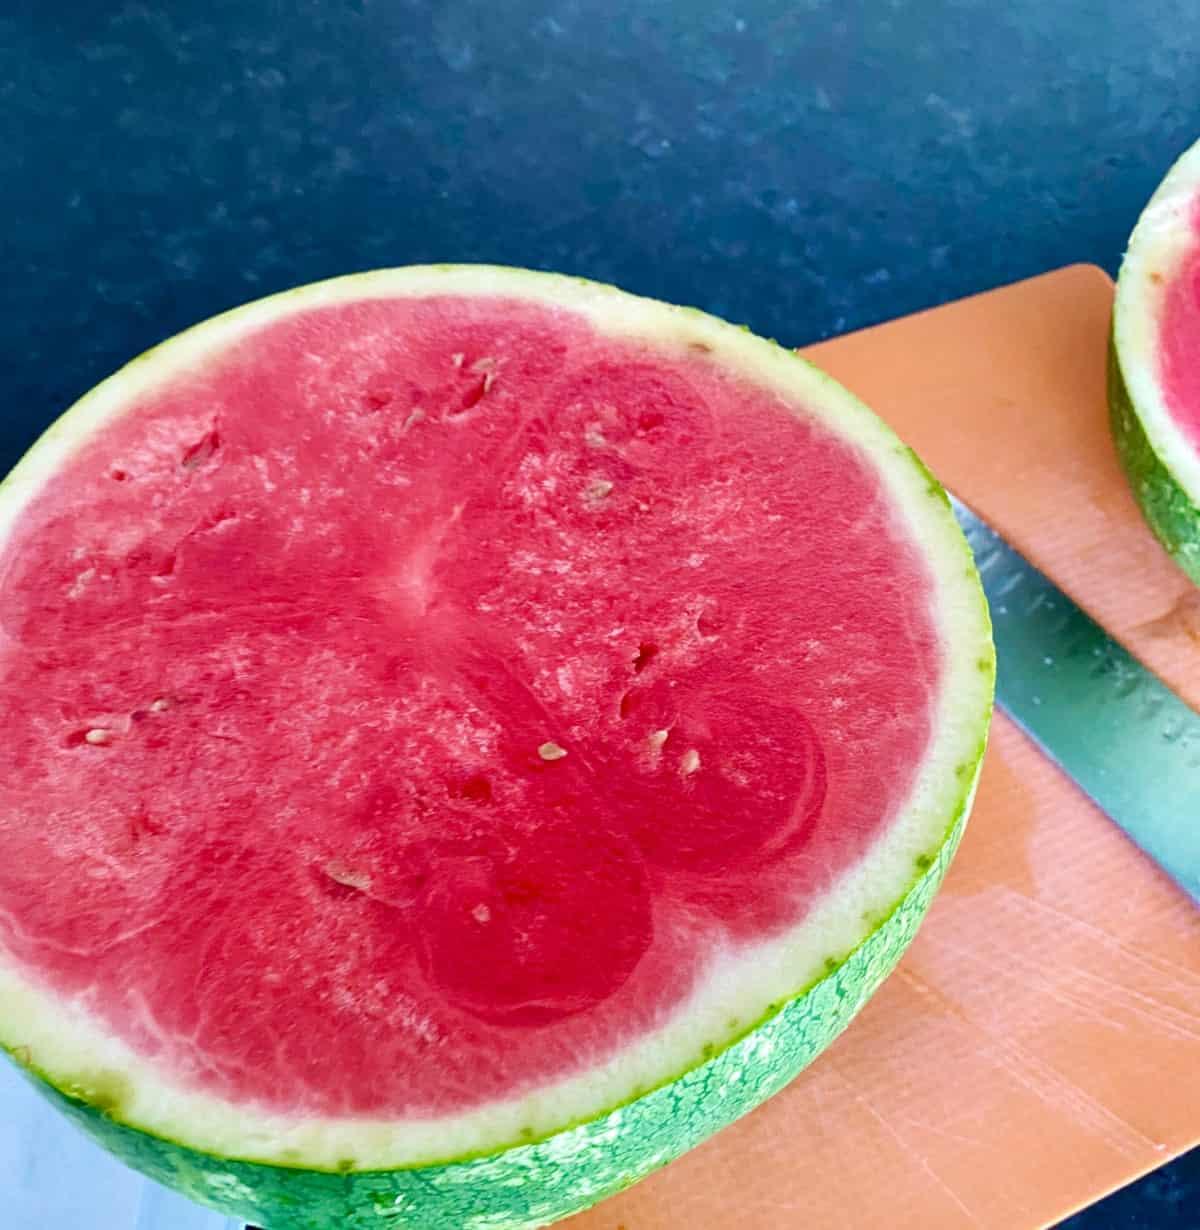 Plain slice of watermelon on orange cutting mat with knife.